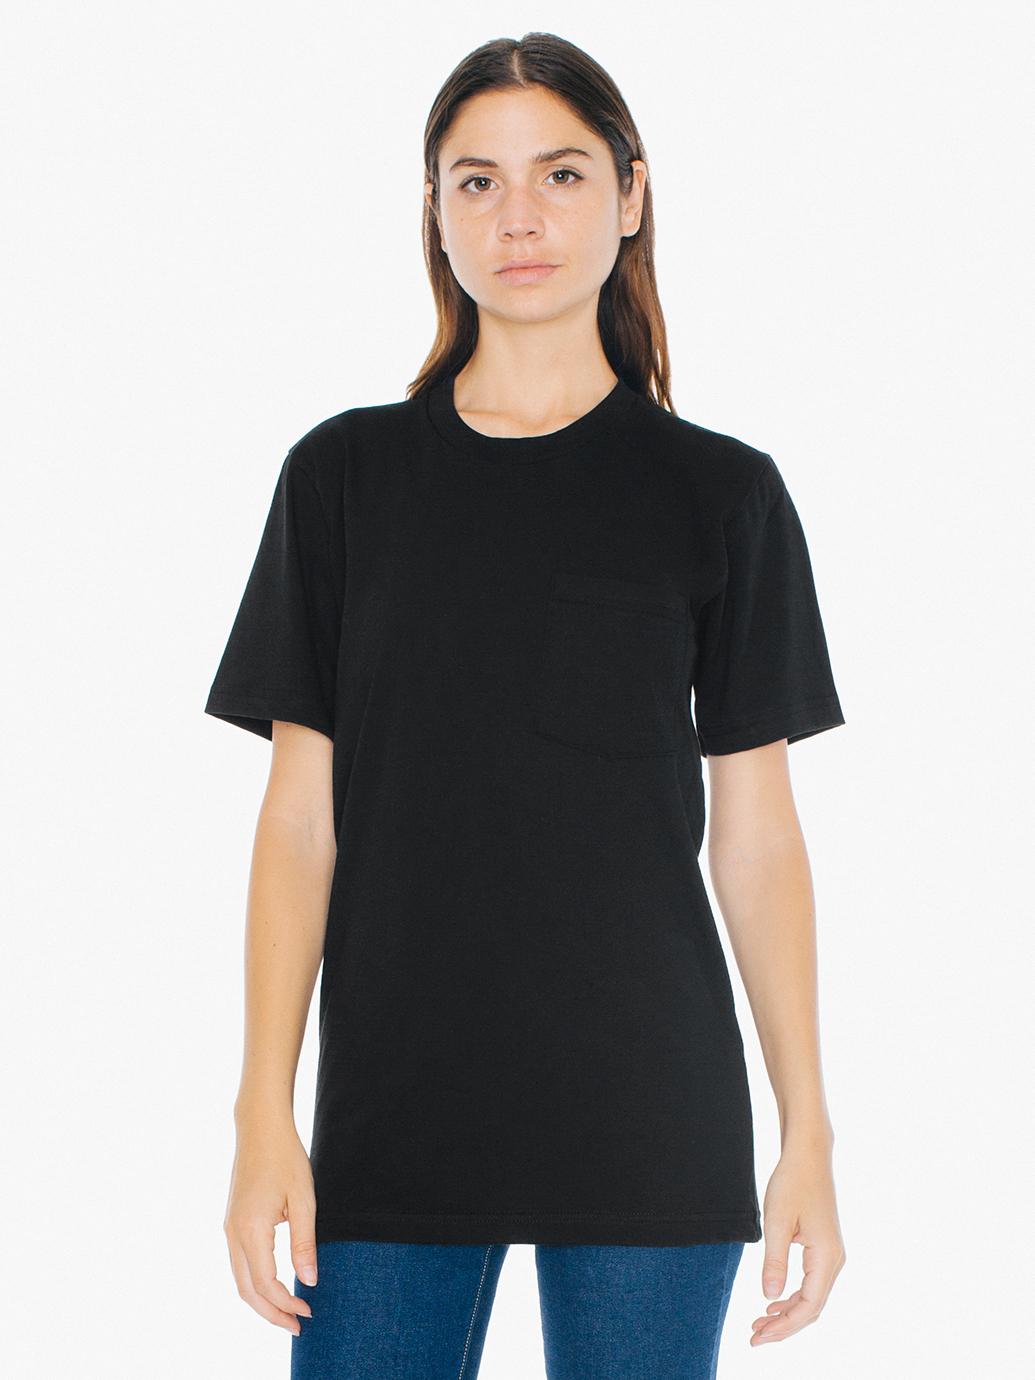 American apparel unisex fine jersey crewneck pocket t for American apparel fine jersey crewneck t shirt